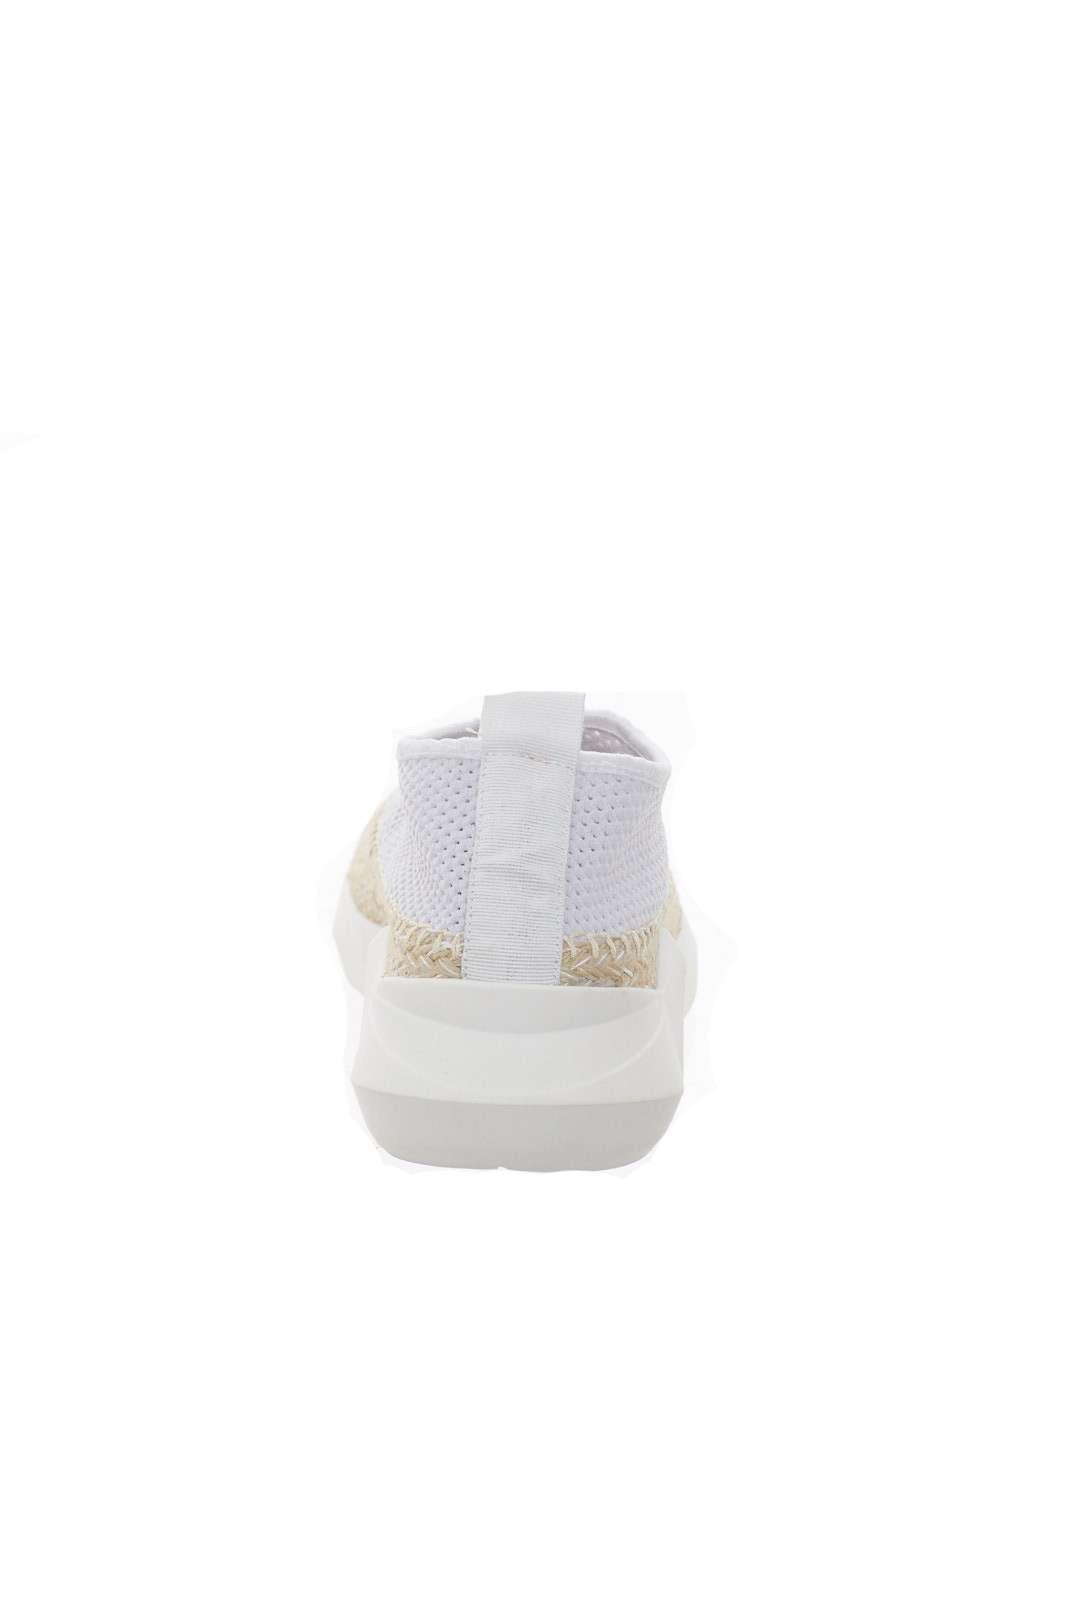 https://www.parmax.com/media/catalog/product/a/i/PE-outlet_parmax-scarpe-donna-PF16-117-D.jpg